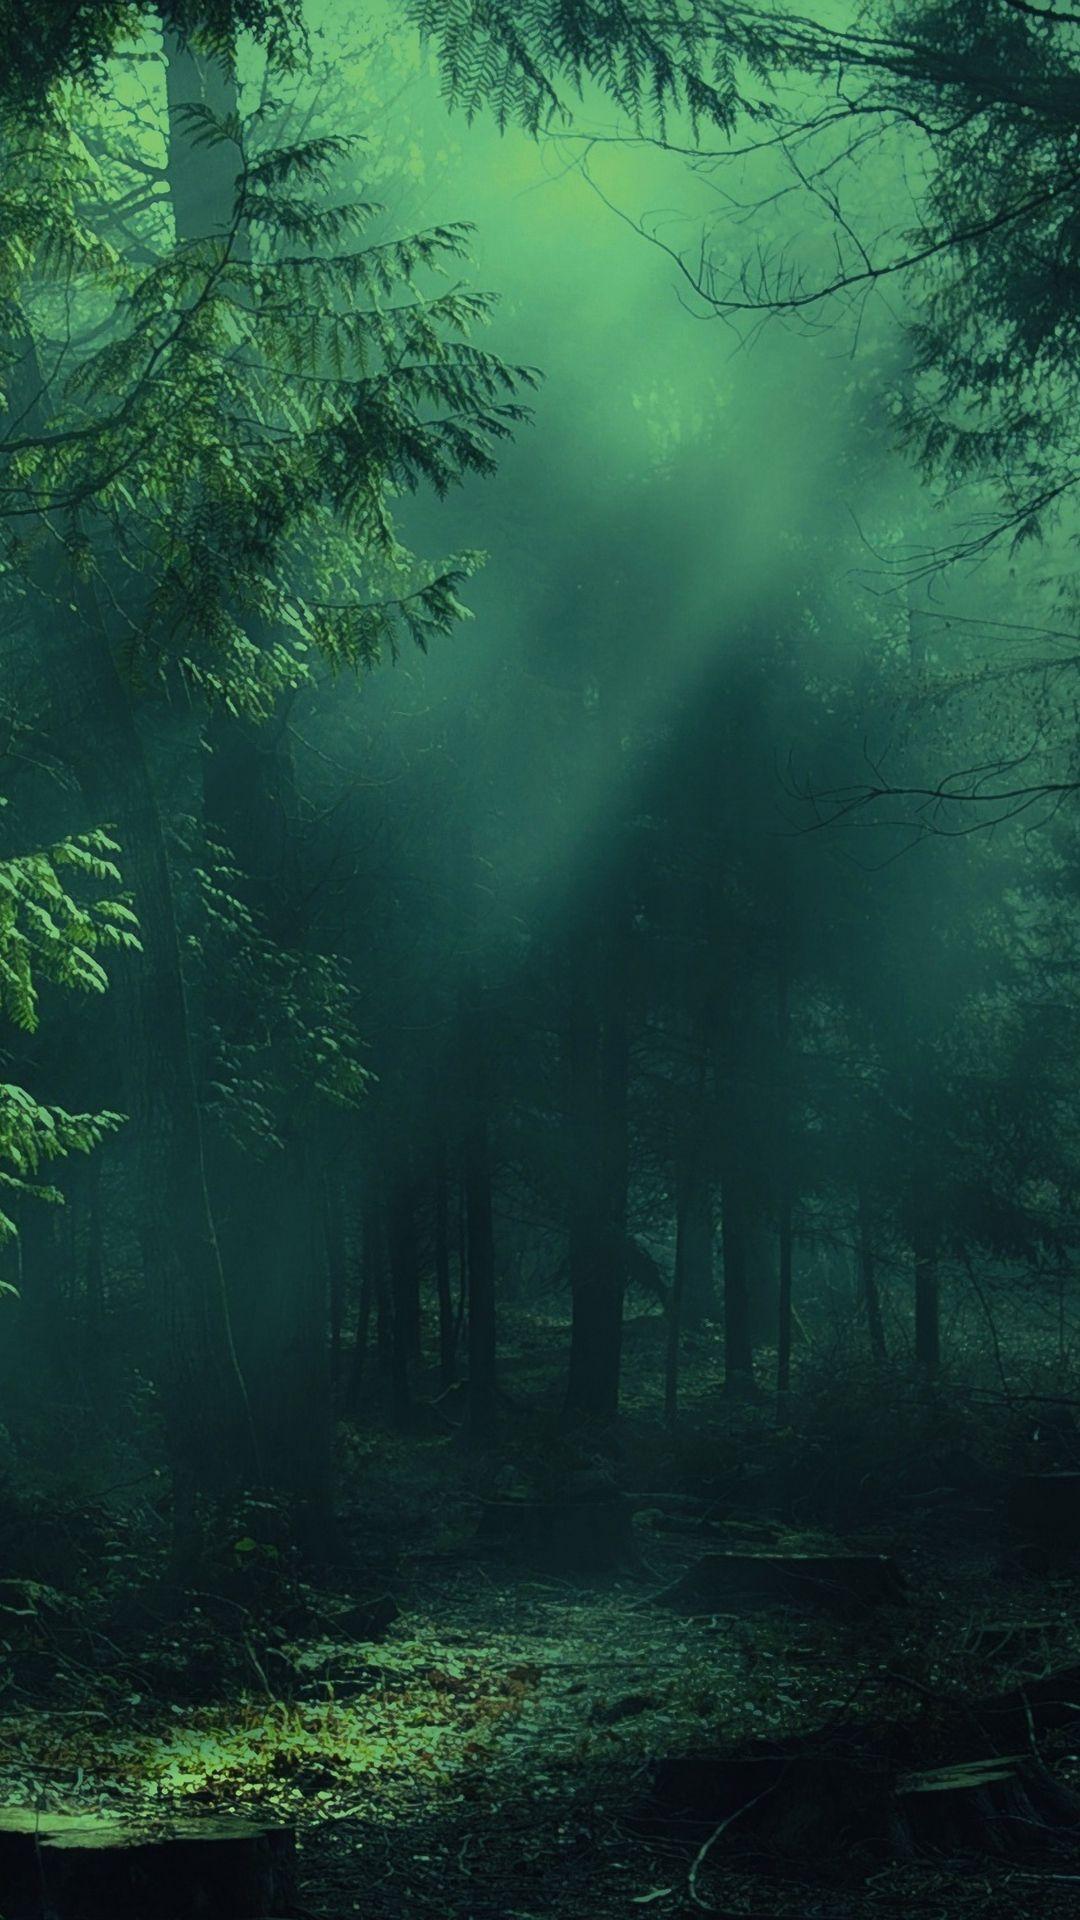 1080x1920 Wallpaper Forest Fog Trees Shadows Light Forest Wallpaper Hd Nature Wallpapers Forest Wallpaper Iphone